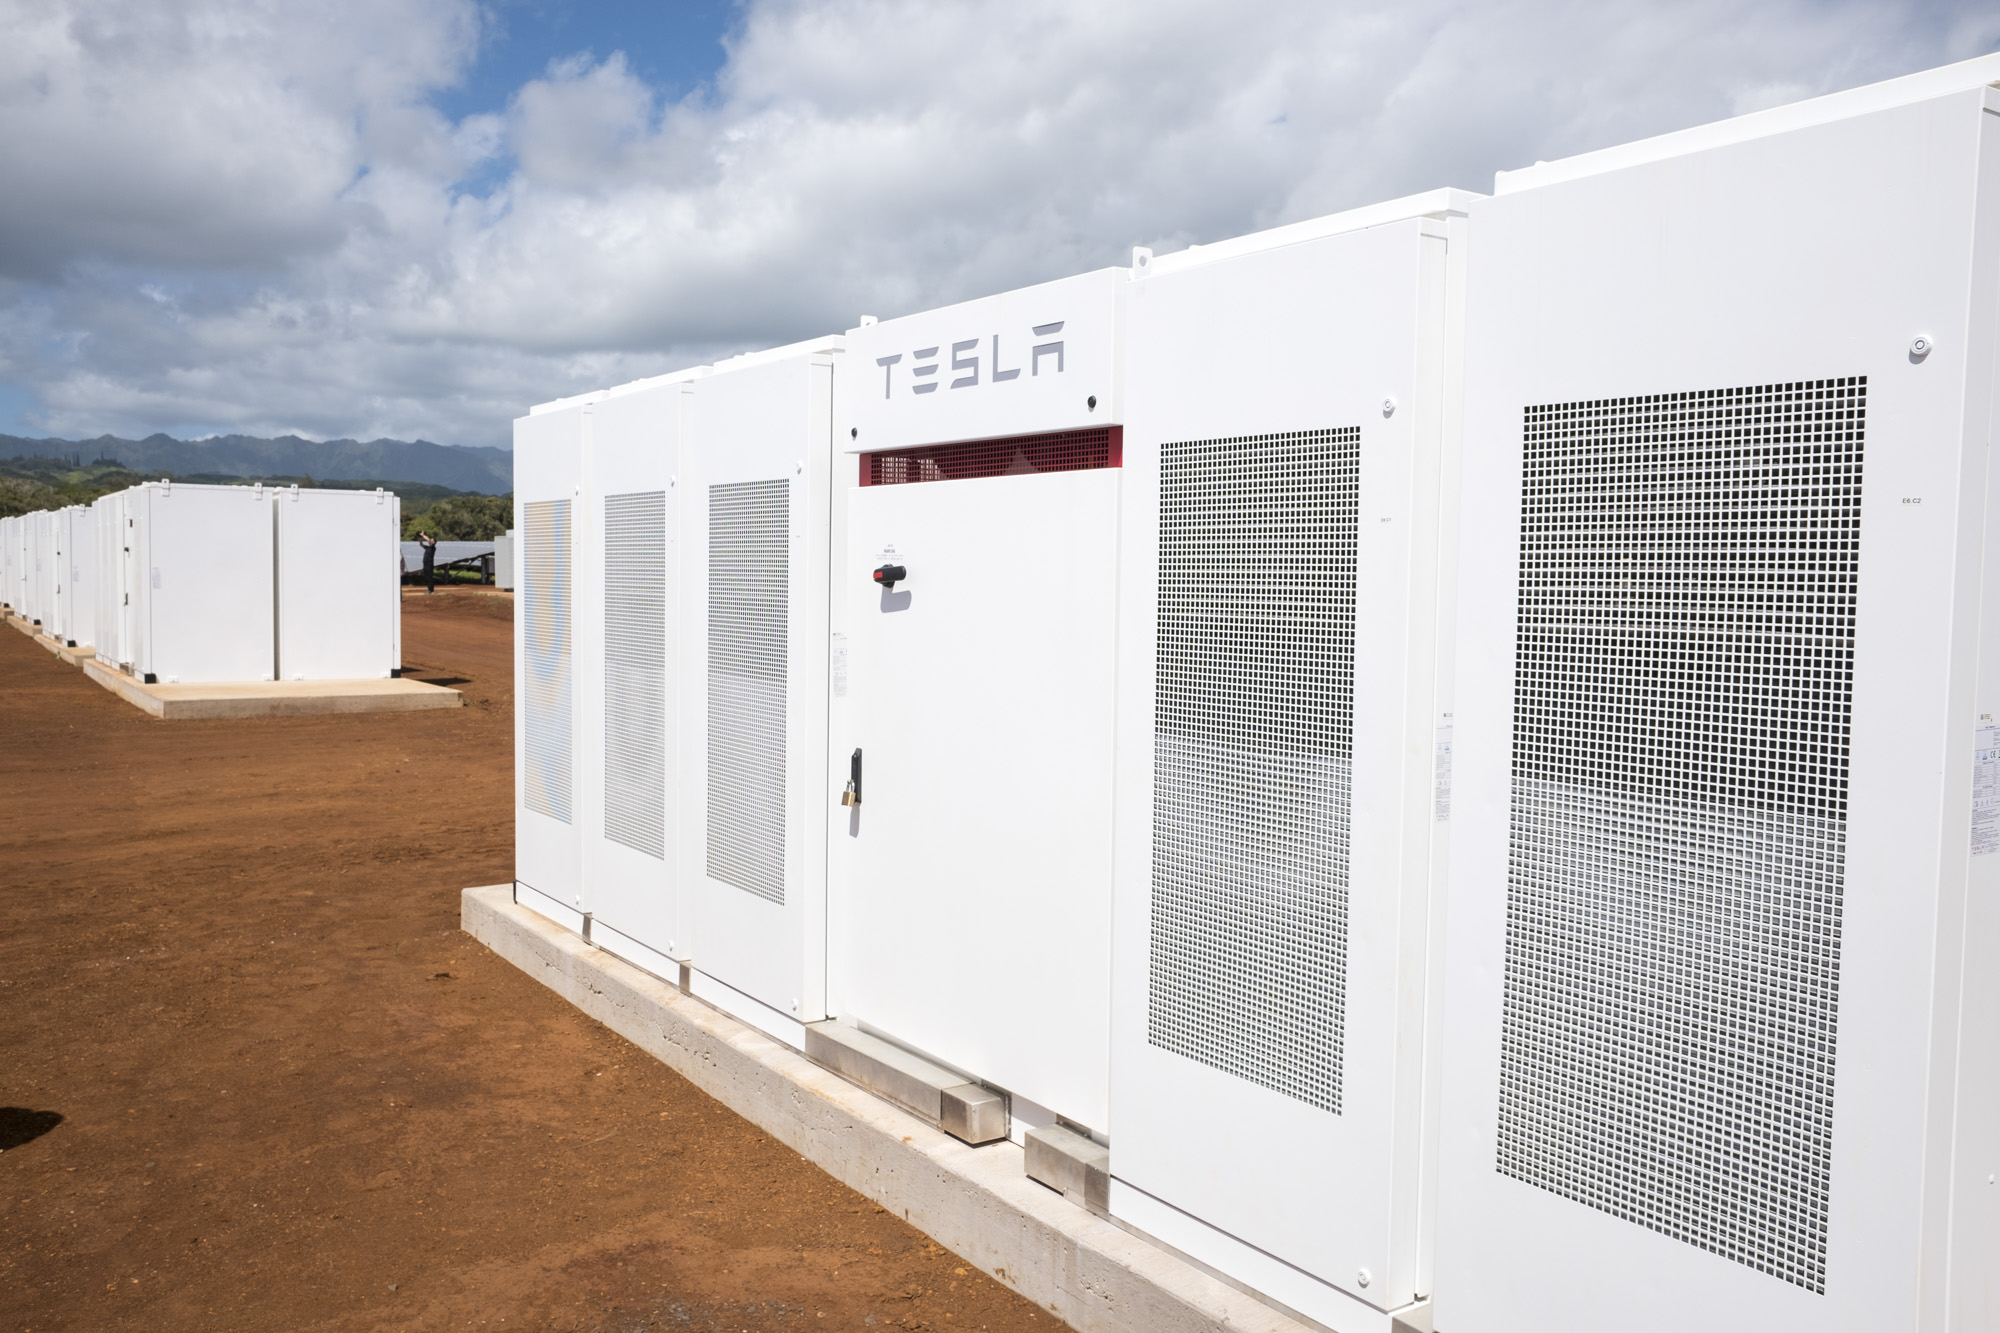 Tesla S Kauai Solar Storage Facility Offers A Glimpse Of